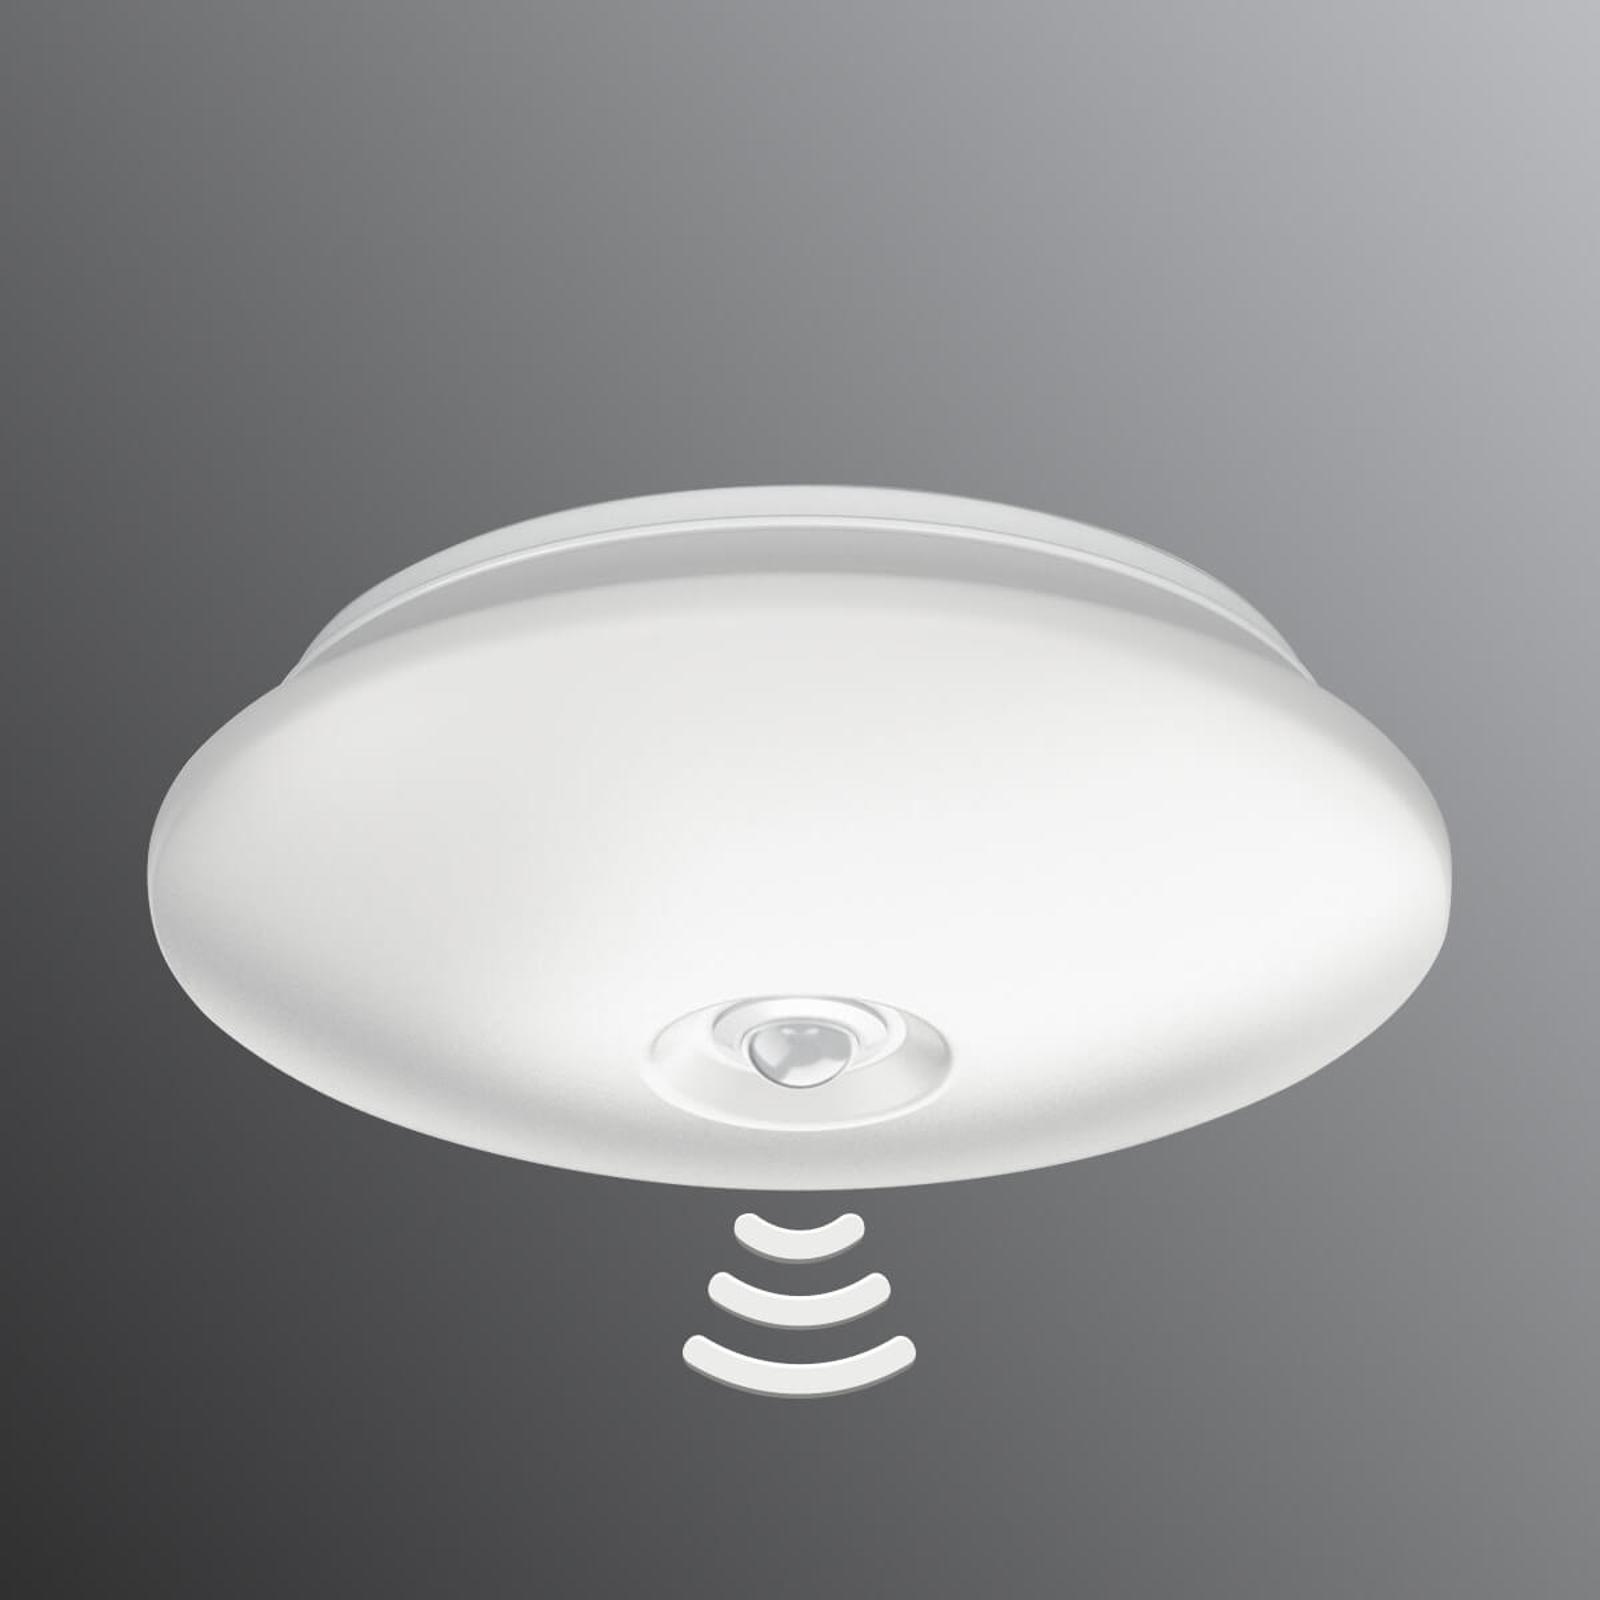 Philips Mauve LED-Deckenleuchte IR-Sensor 25,4 cm